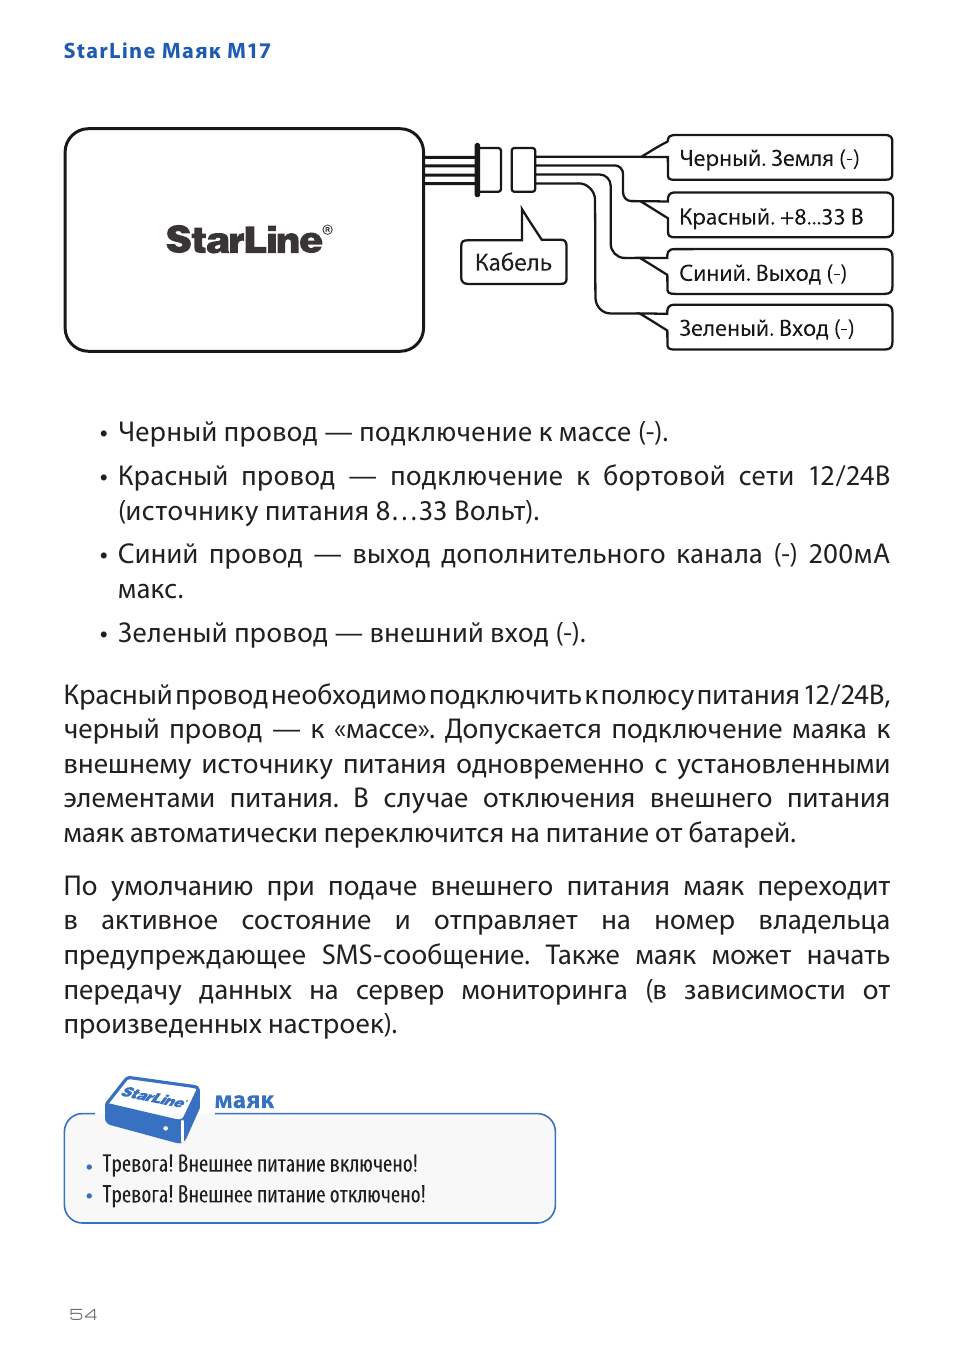 старлайн м 17 инструкция по установке